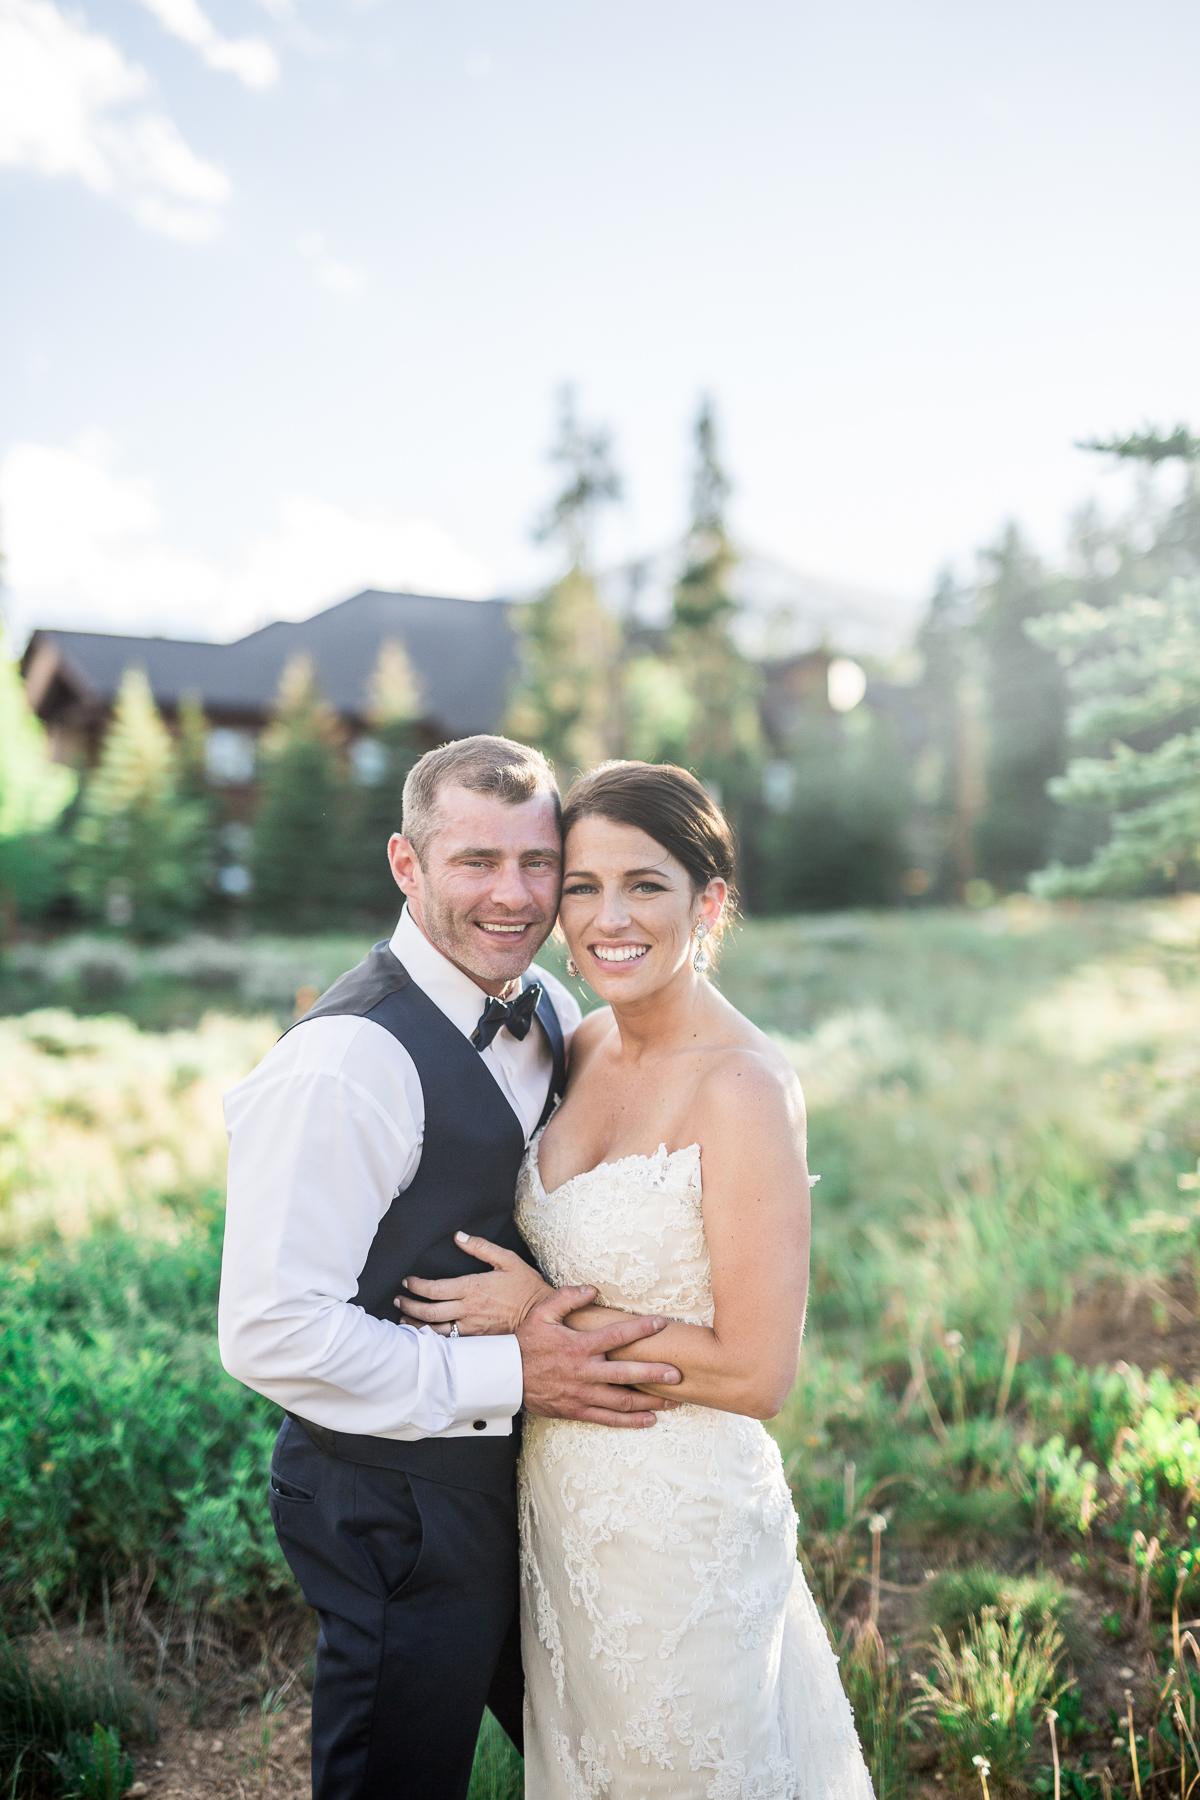 StaciDesign-Colorado-Wedding-5543.jpg